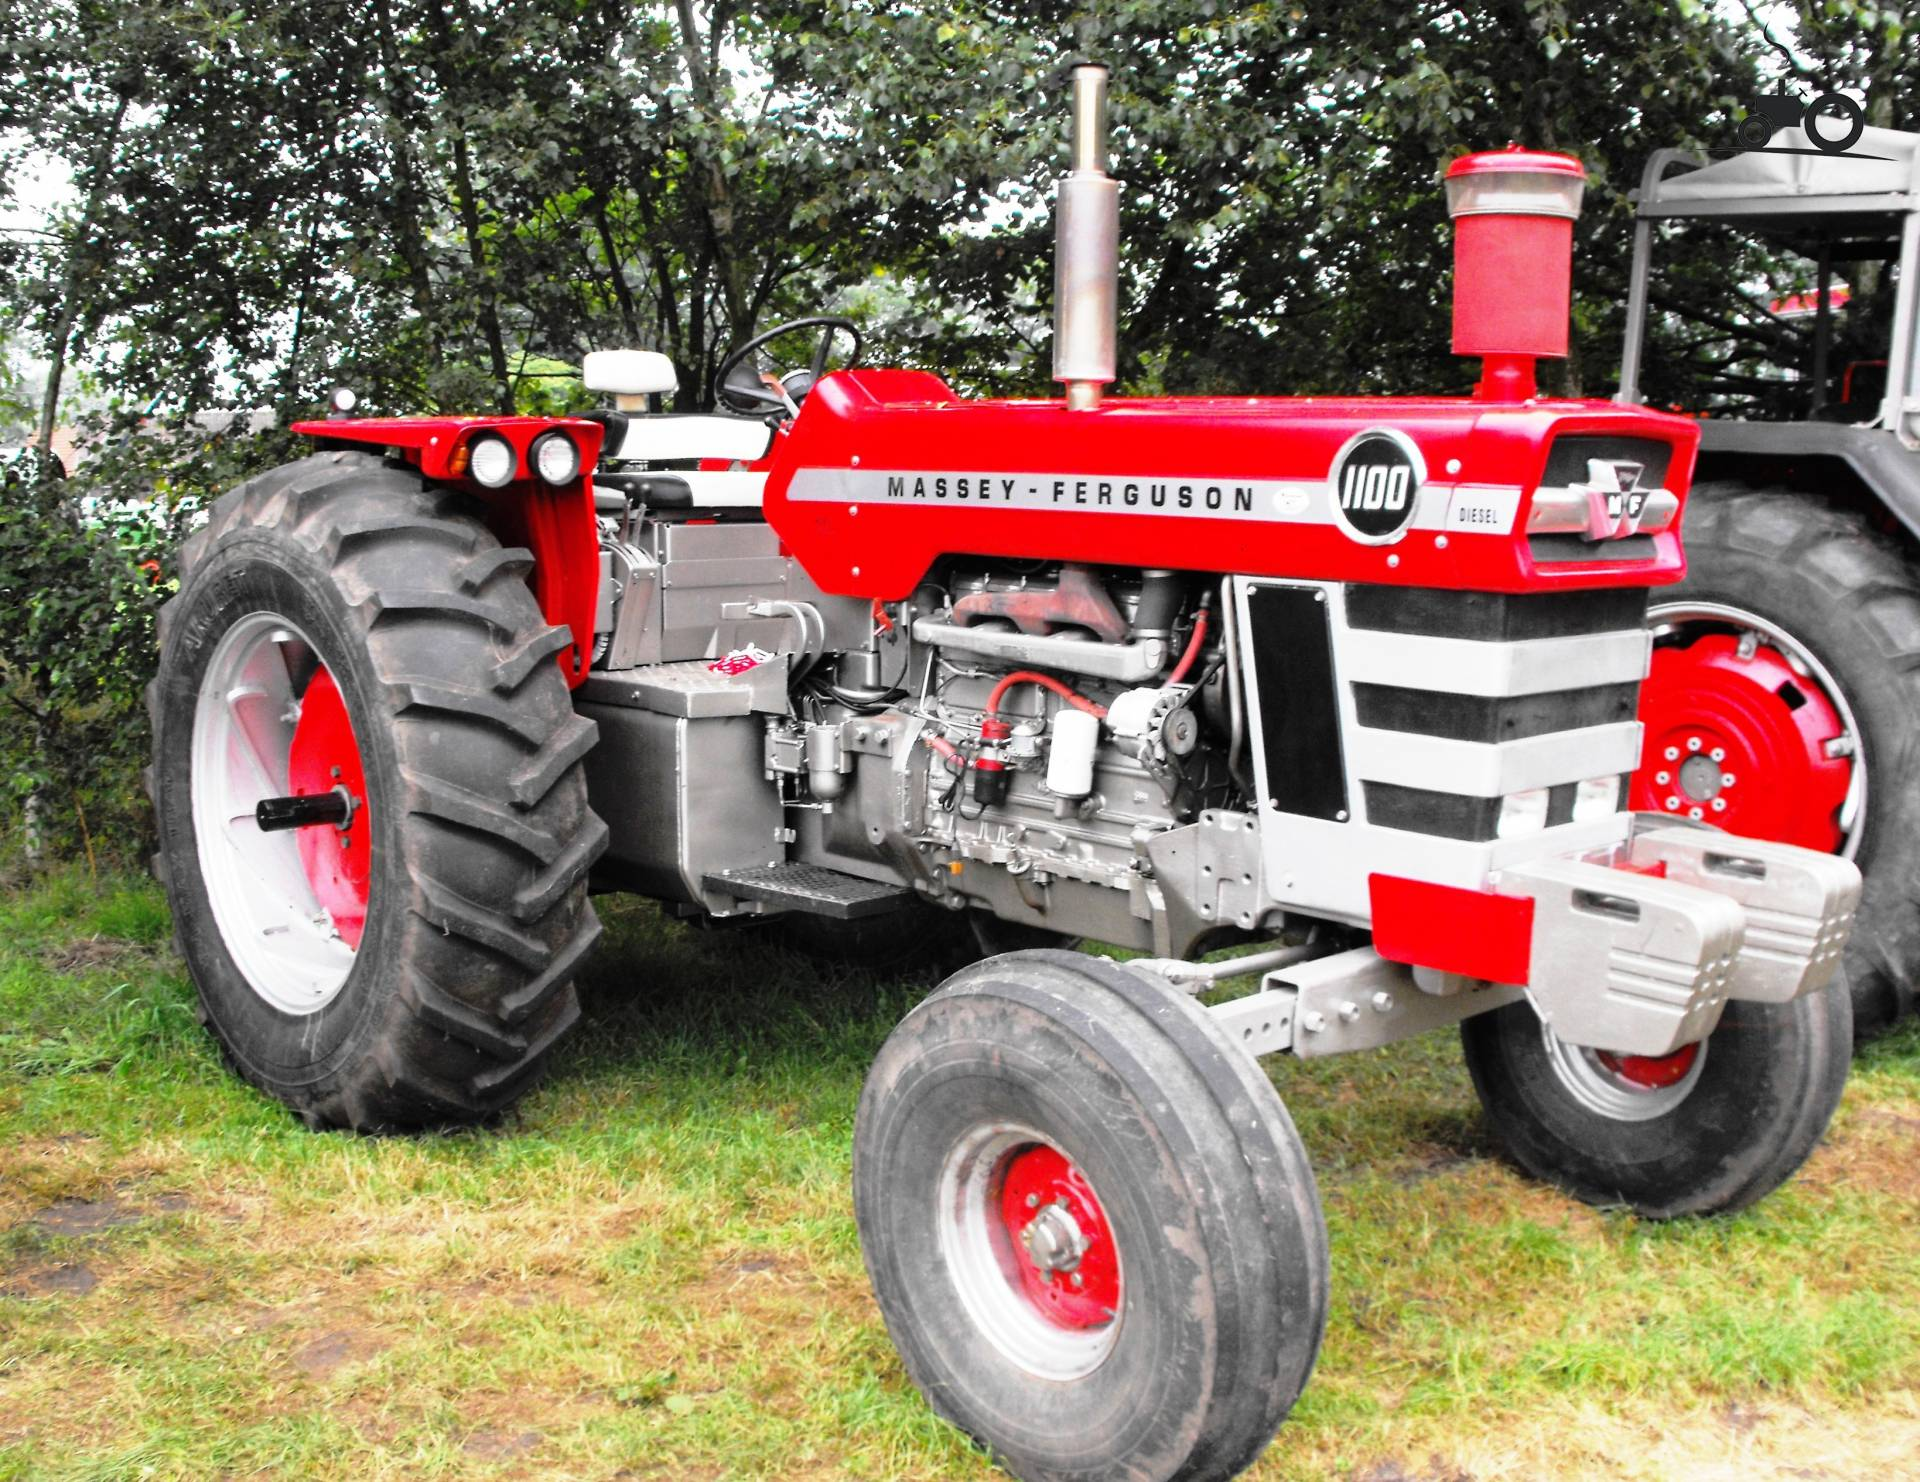 Massey Ferguson 1100 : Massey ferguson wheatland tractor bing images